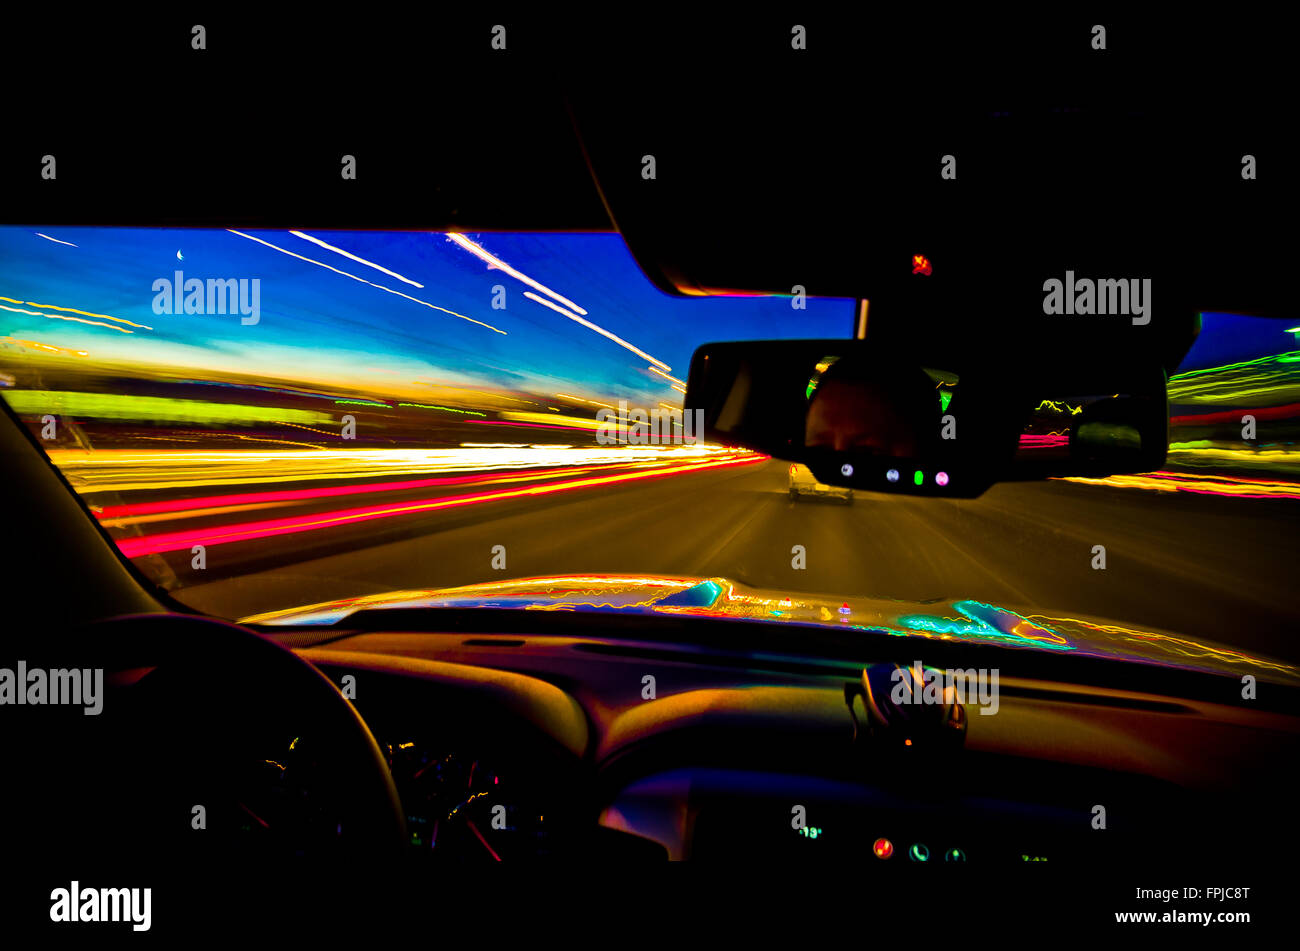 Time warp behind the wheel - Stock Image